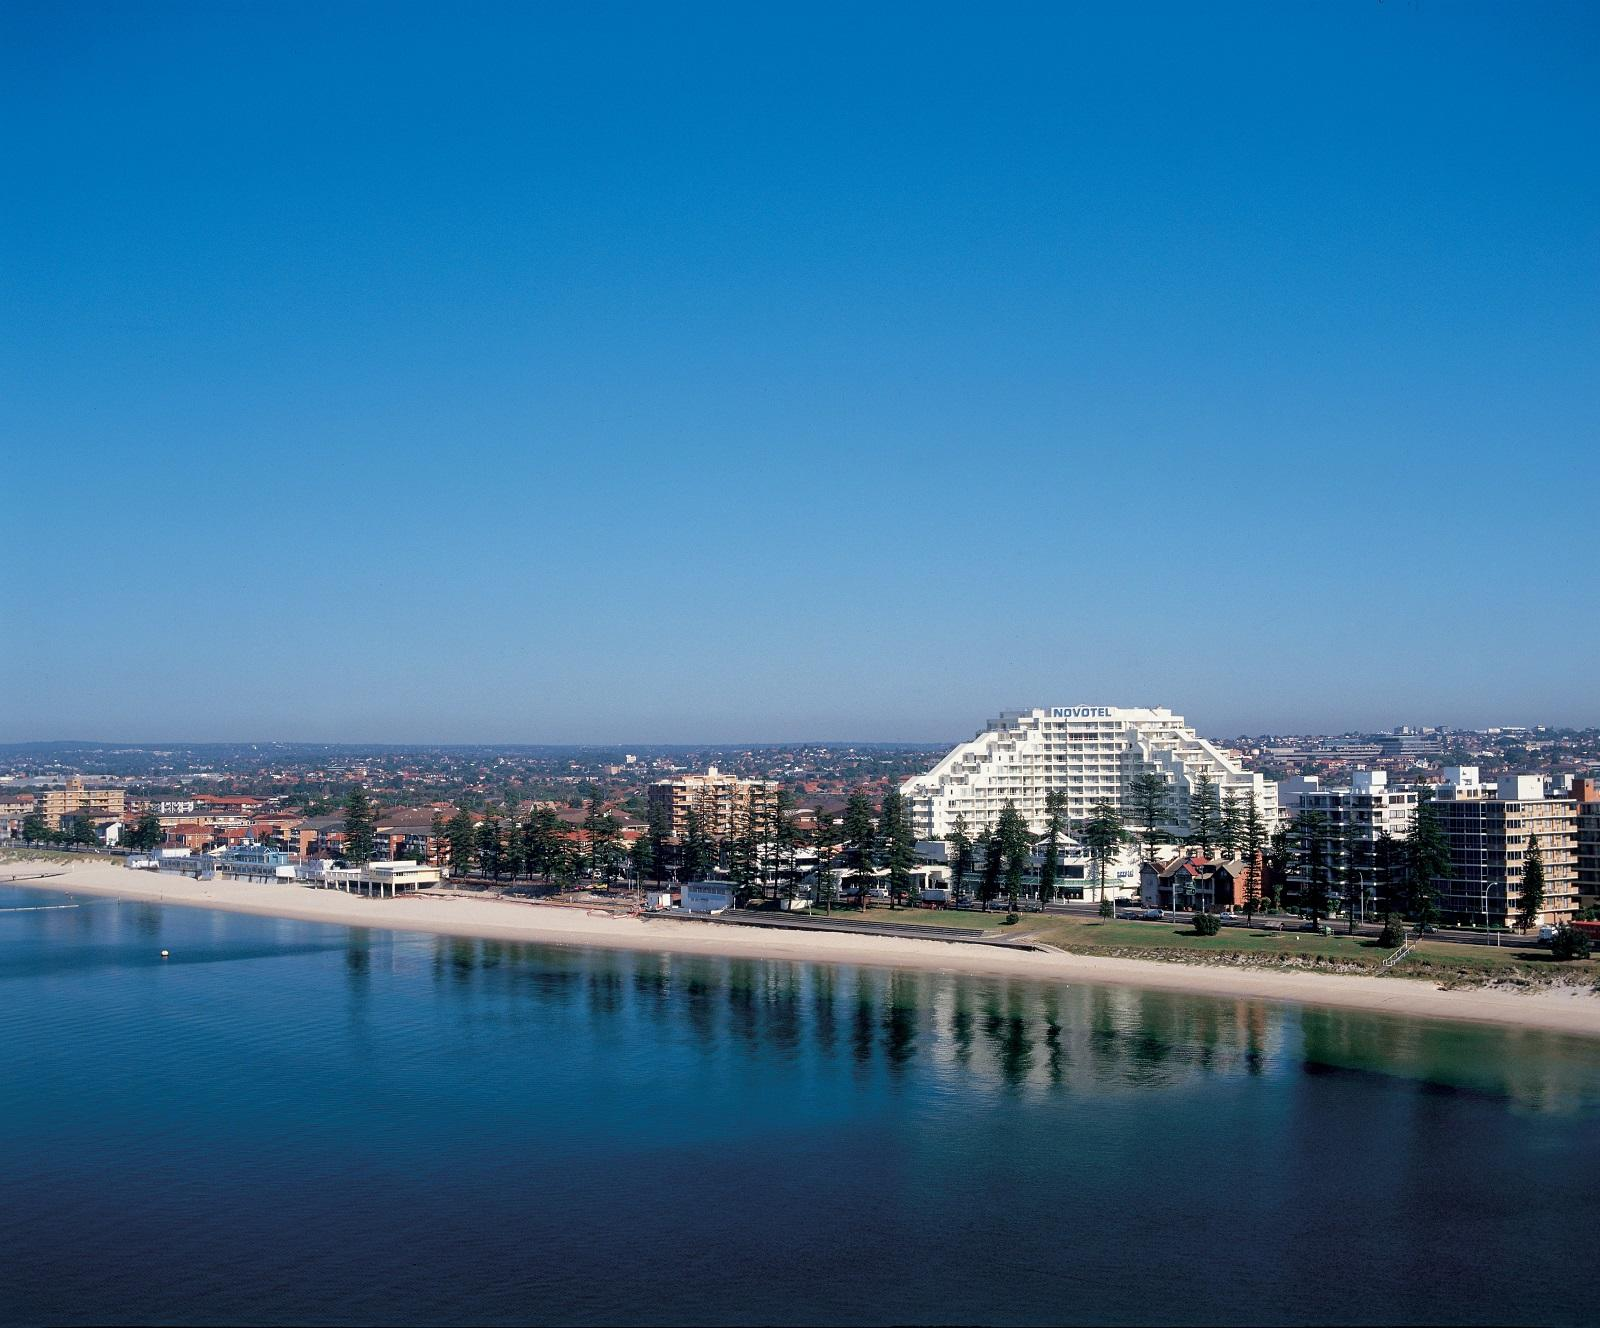 Hotel in NSW Sydney 2216 Novotel Sydney Brighton Beach The Grand Parade, Brighton-Le-Sands  0295565111